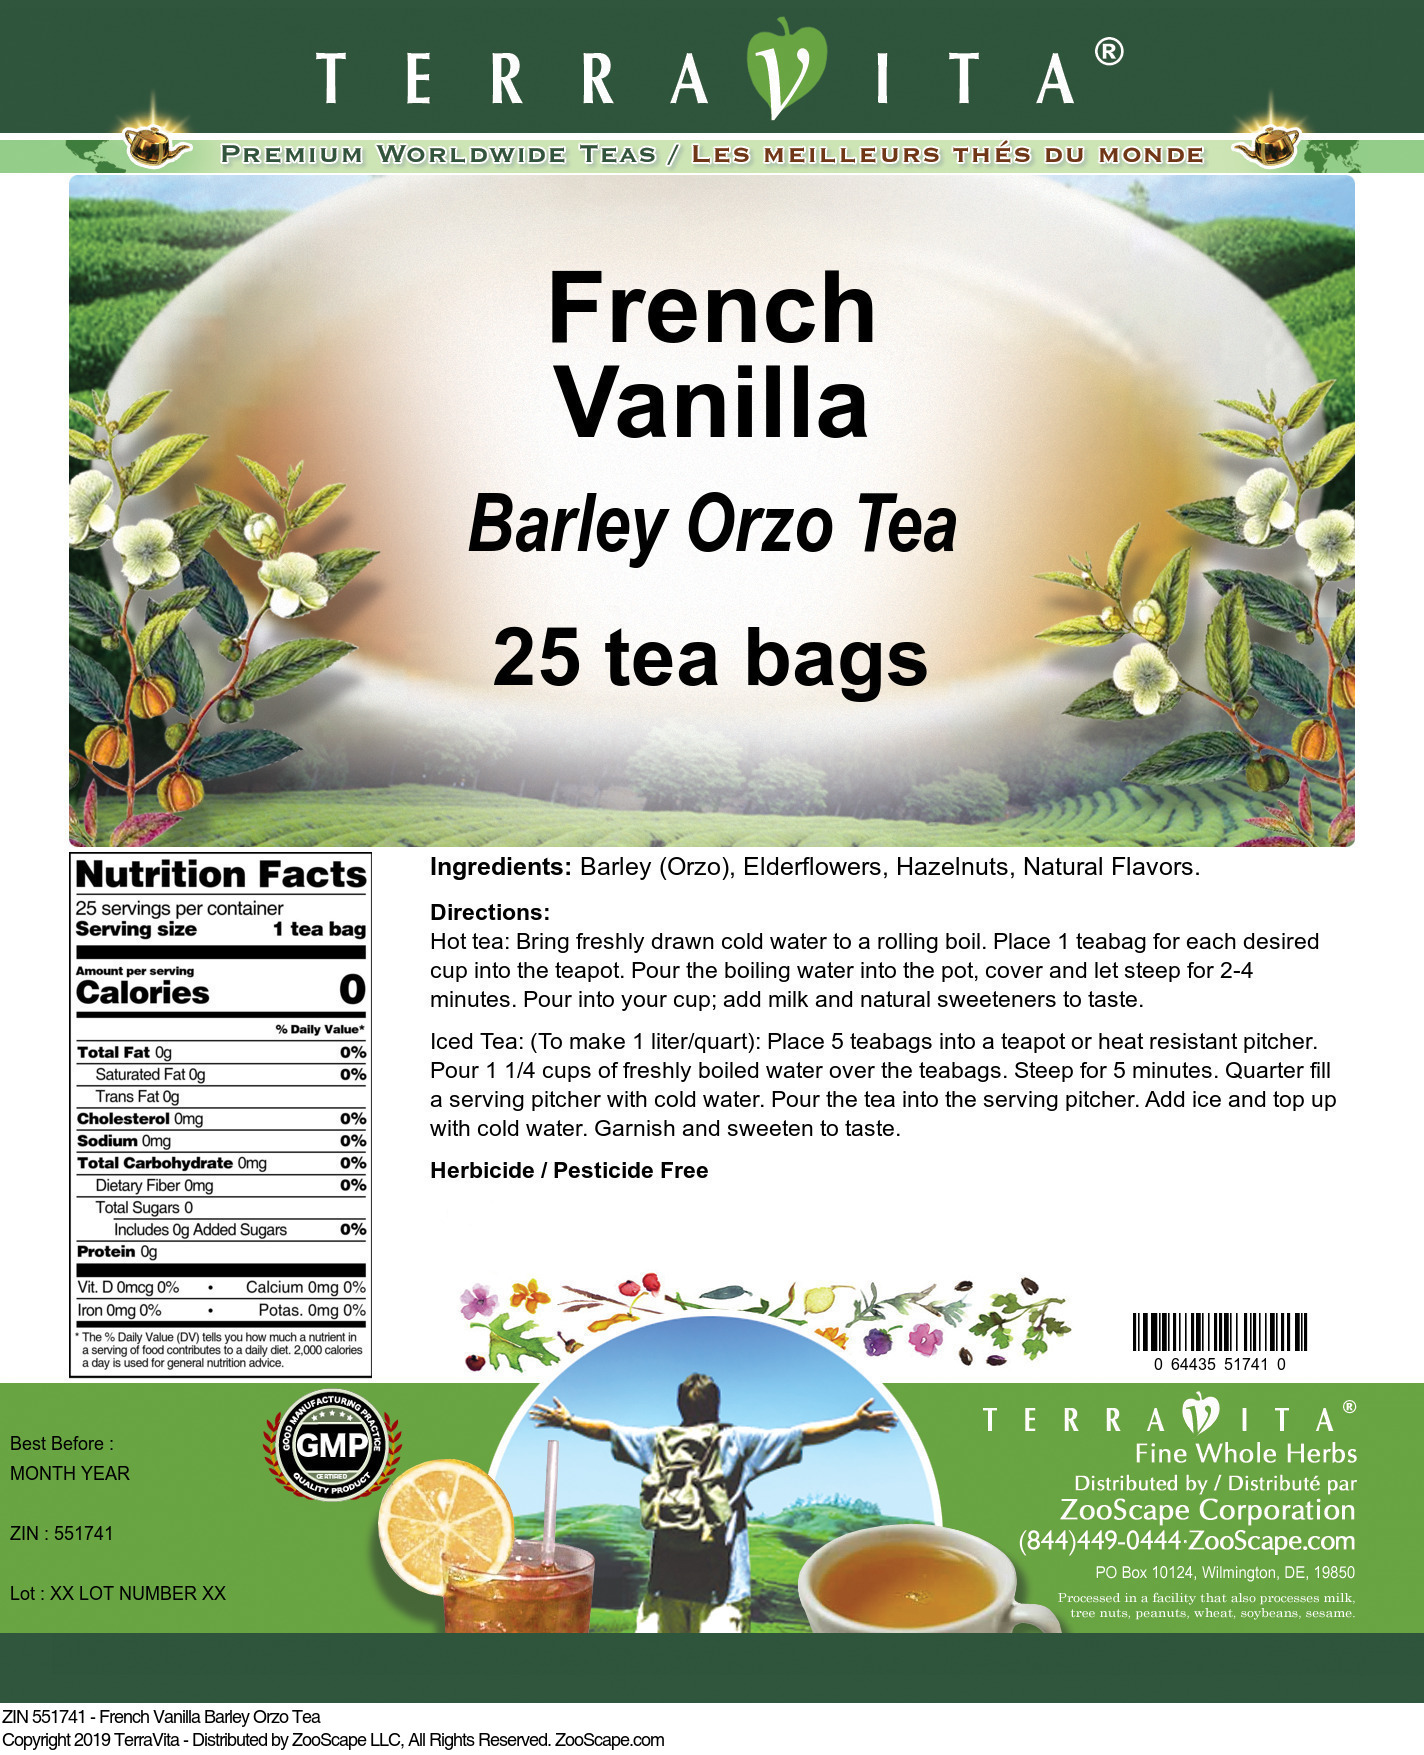 French Vanilla Barley Orzo